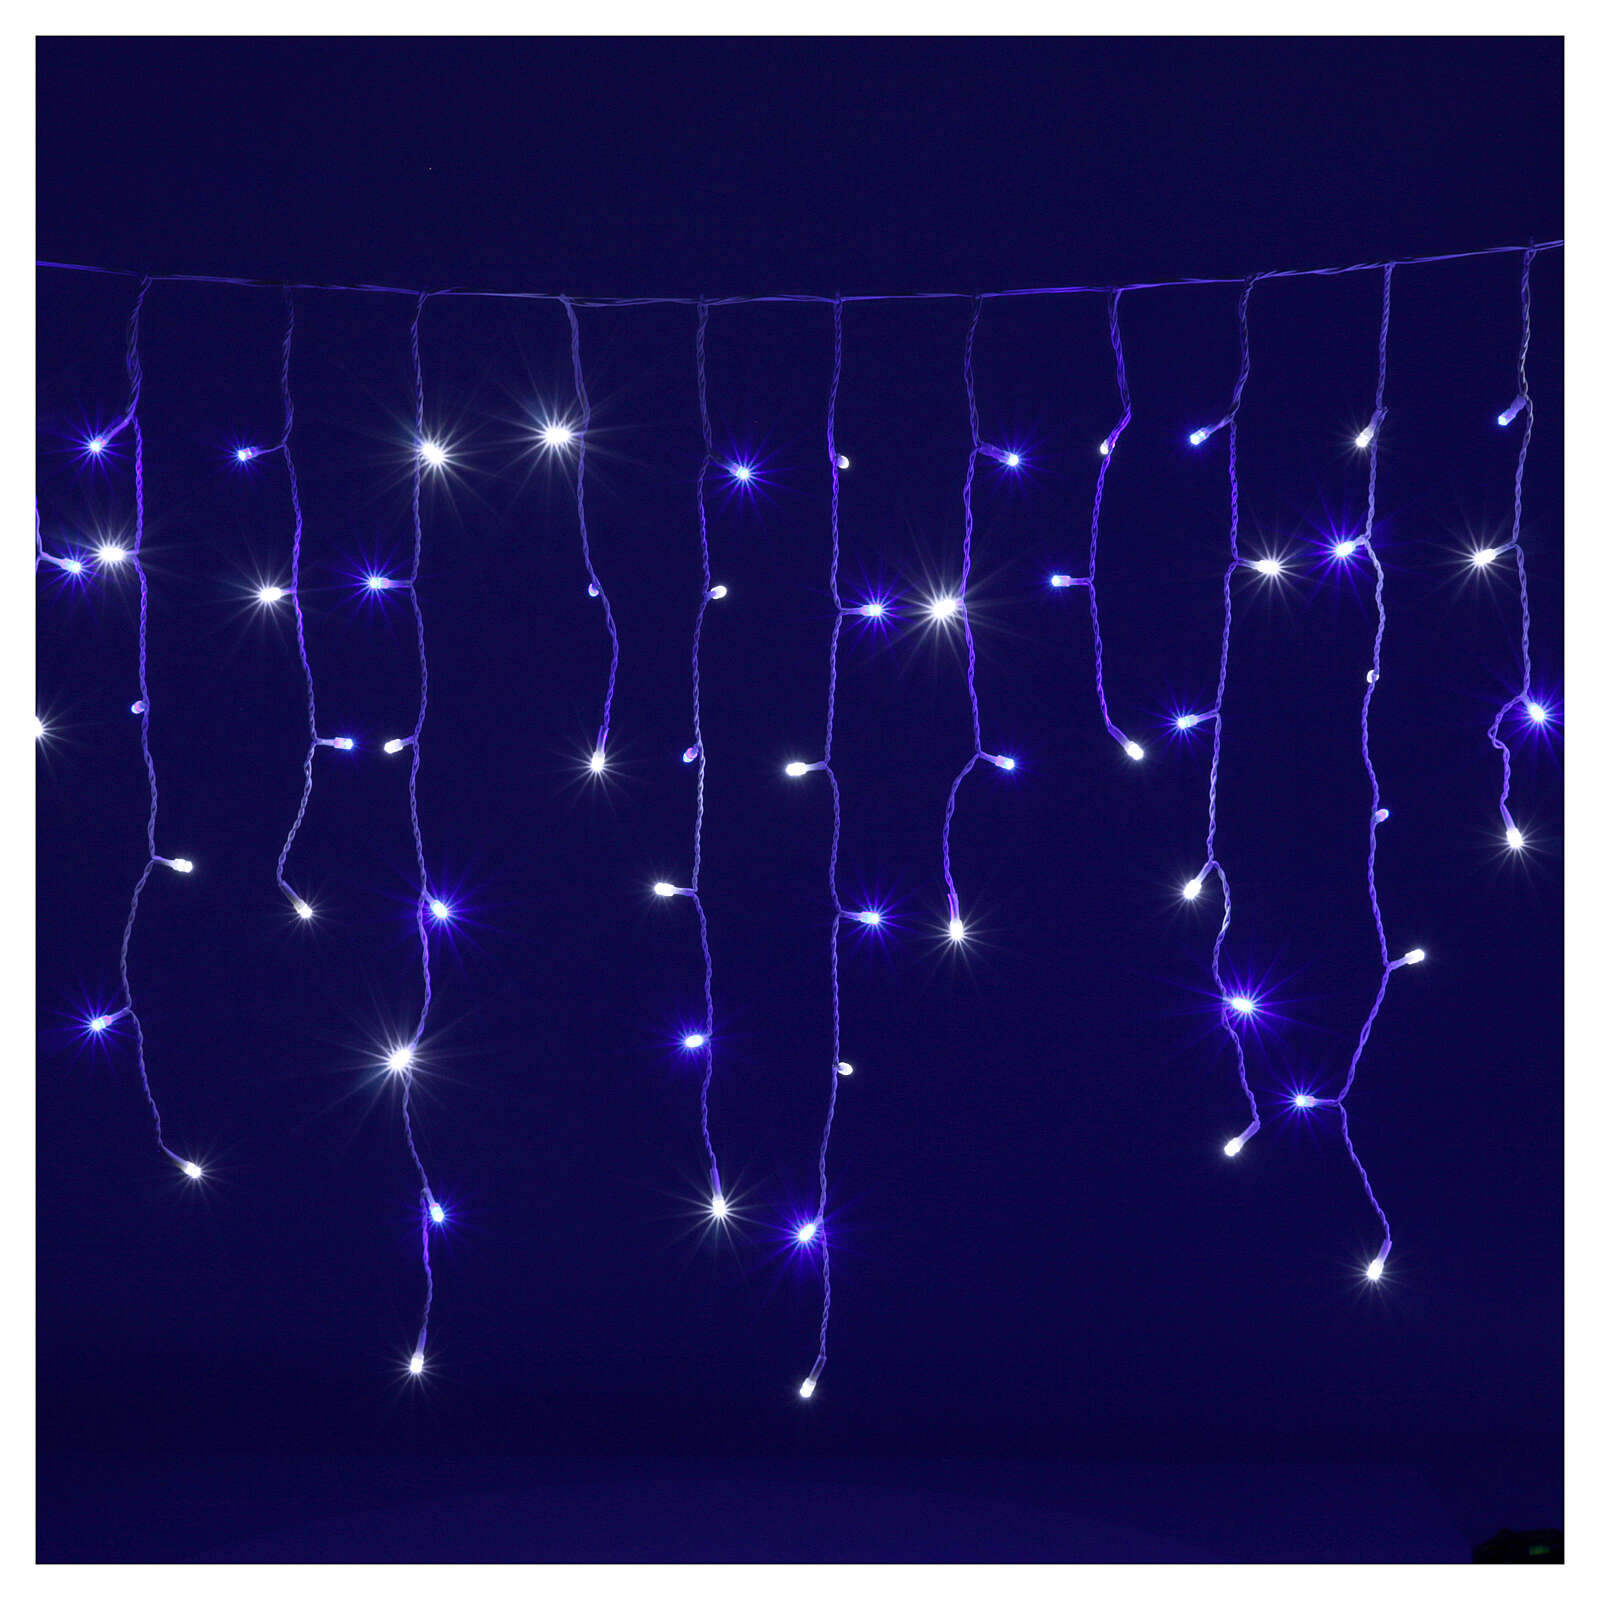 Illuminated chain stalactites 180 leds white and blue internal and external use 3